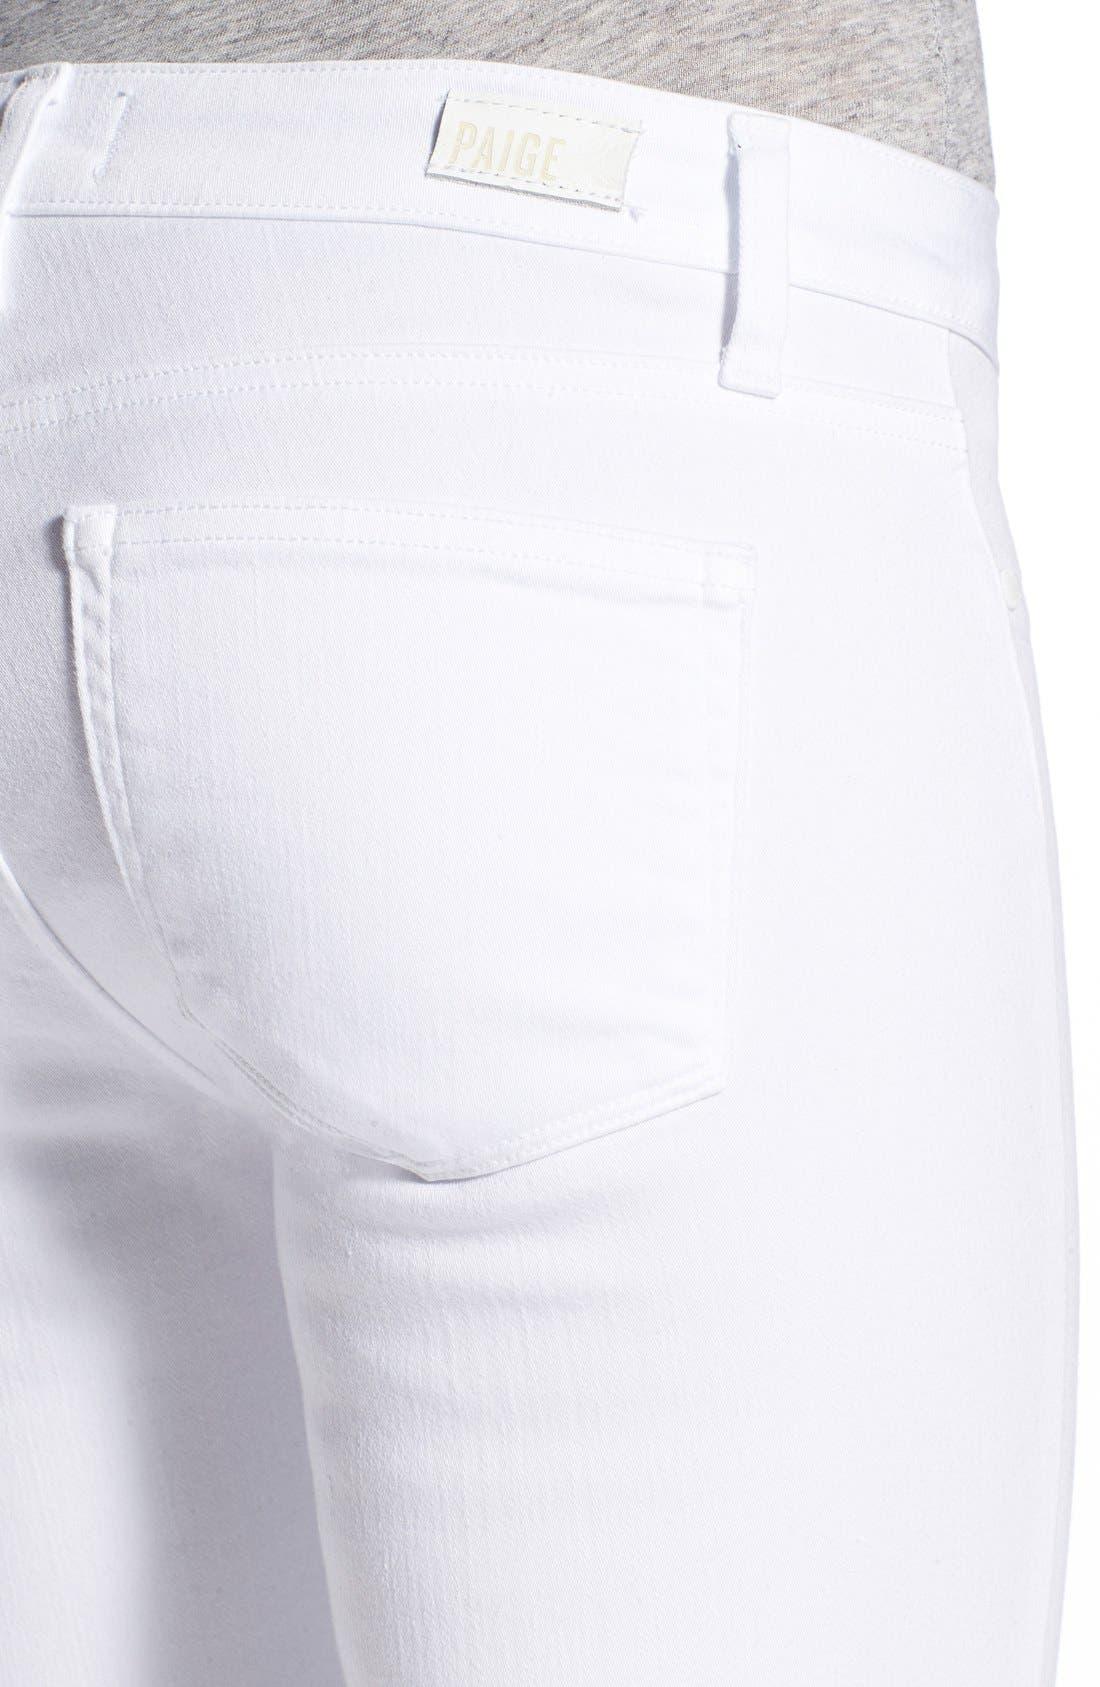 'Verdugo' Ankle Skinny Jeans,                             Alternate thumbnail 2, color,                             ULTRA WHITE